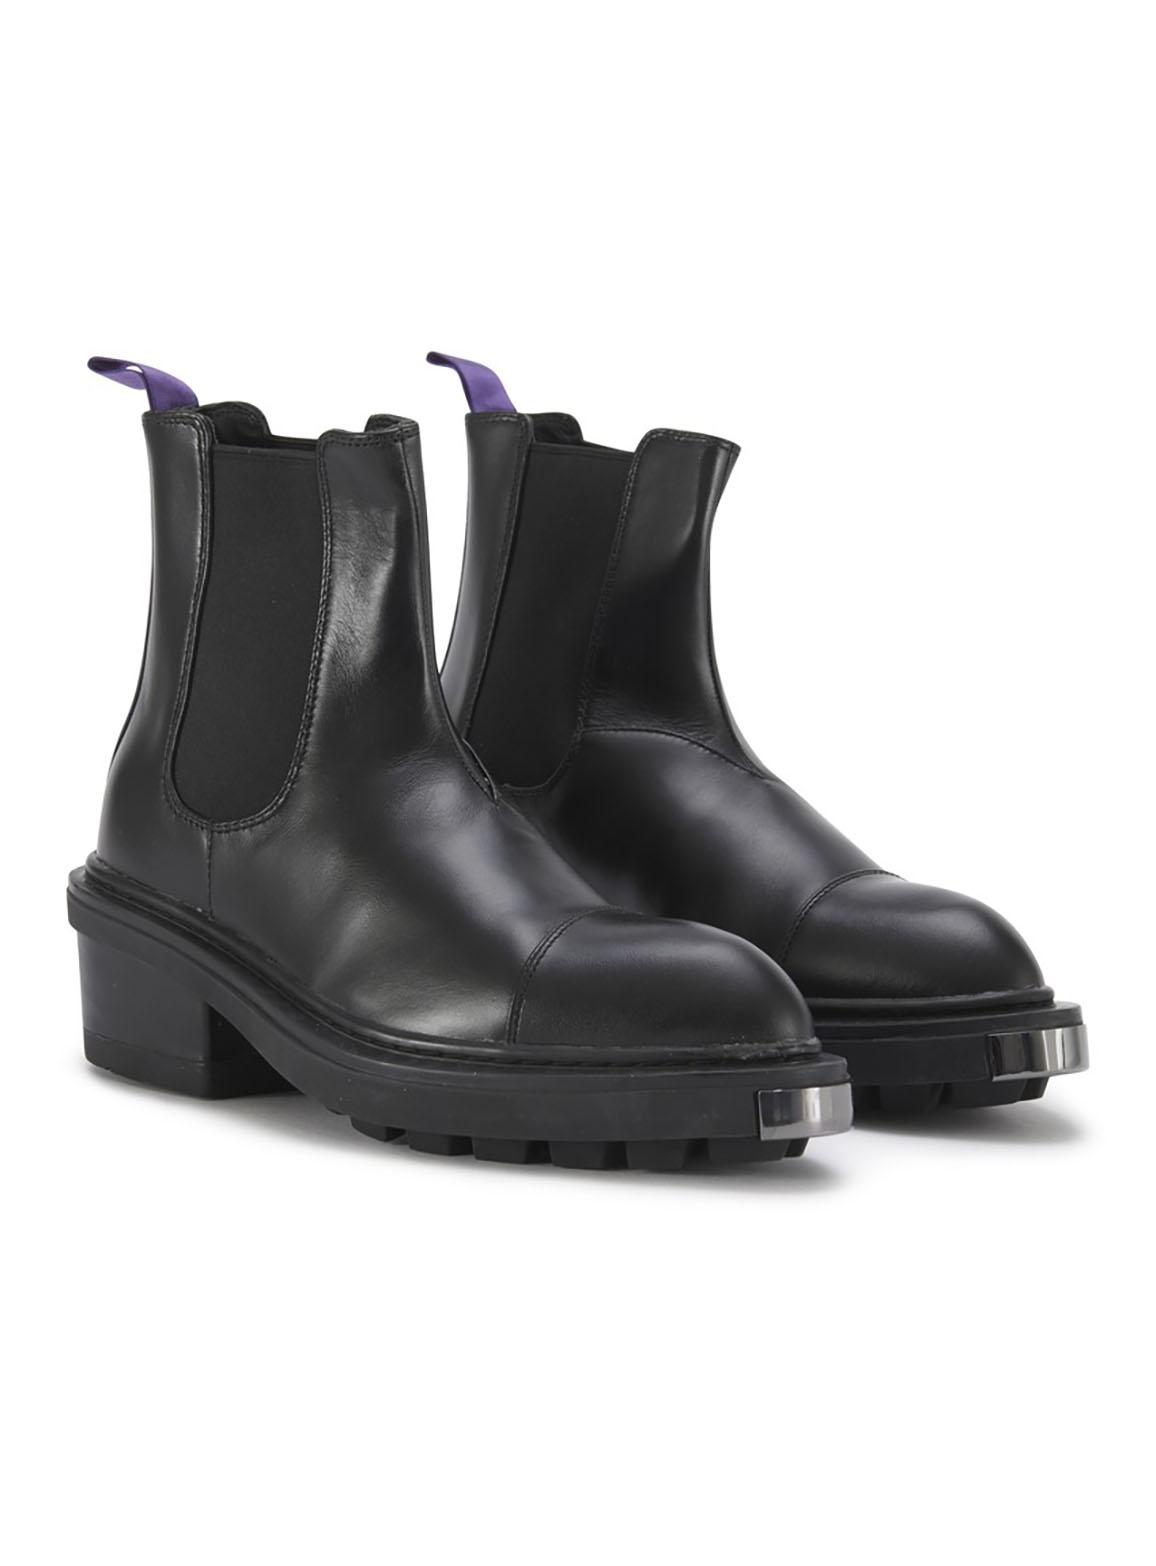 Nikita ankle boots